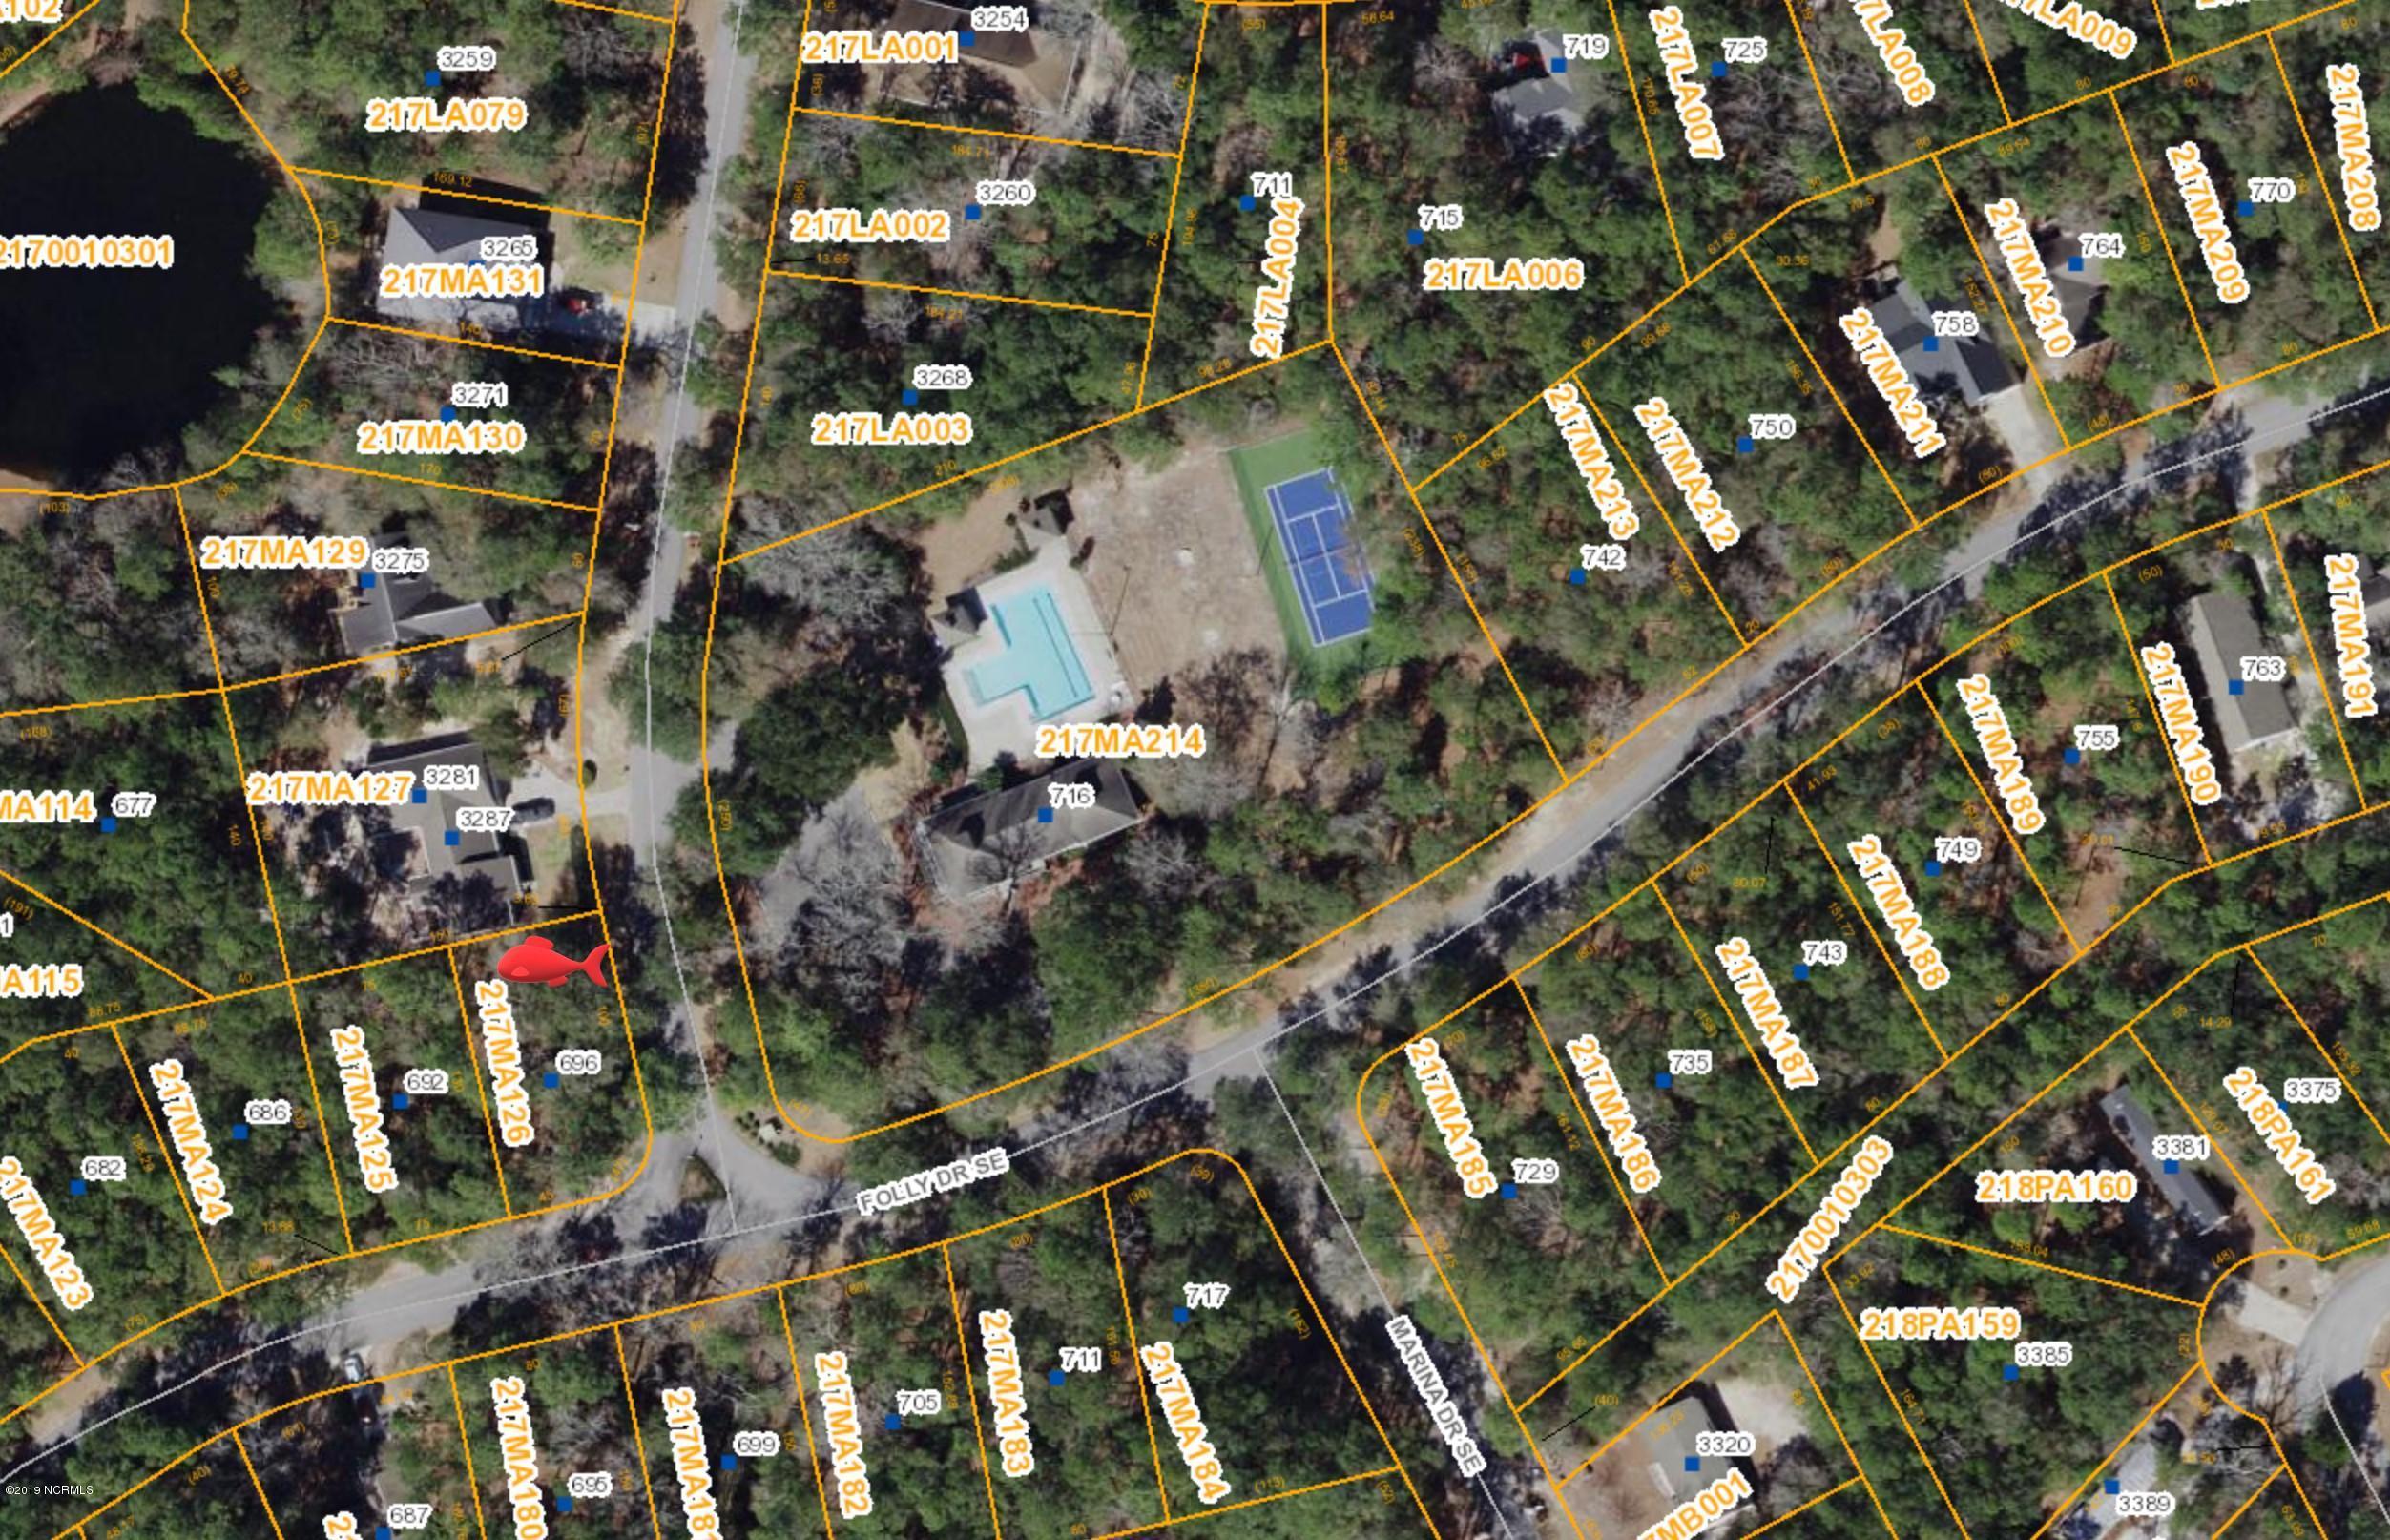 696 Folly Drive, Bolivia, North Carolina 28422, ,Residential land,For sale,Folly,100191198